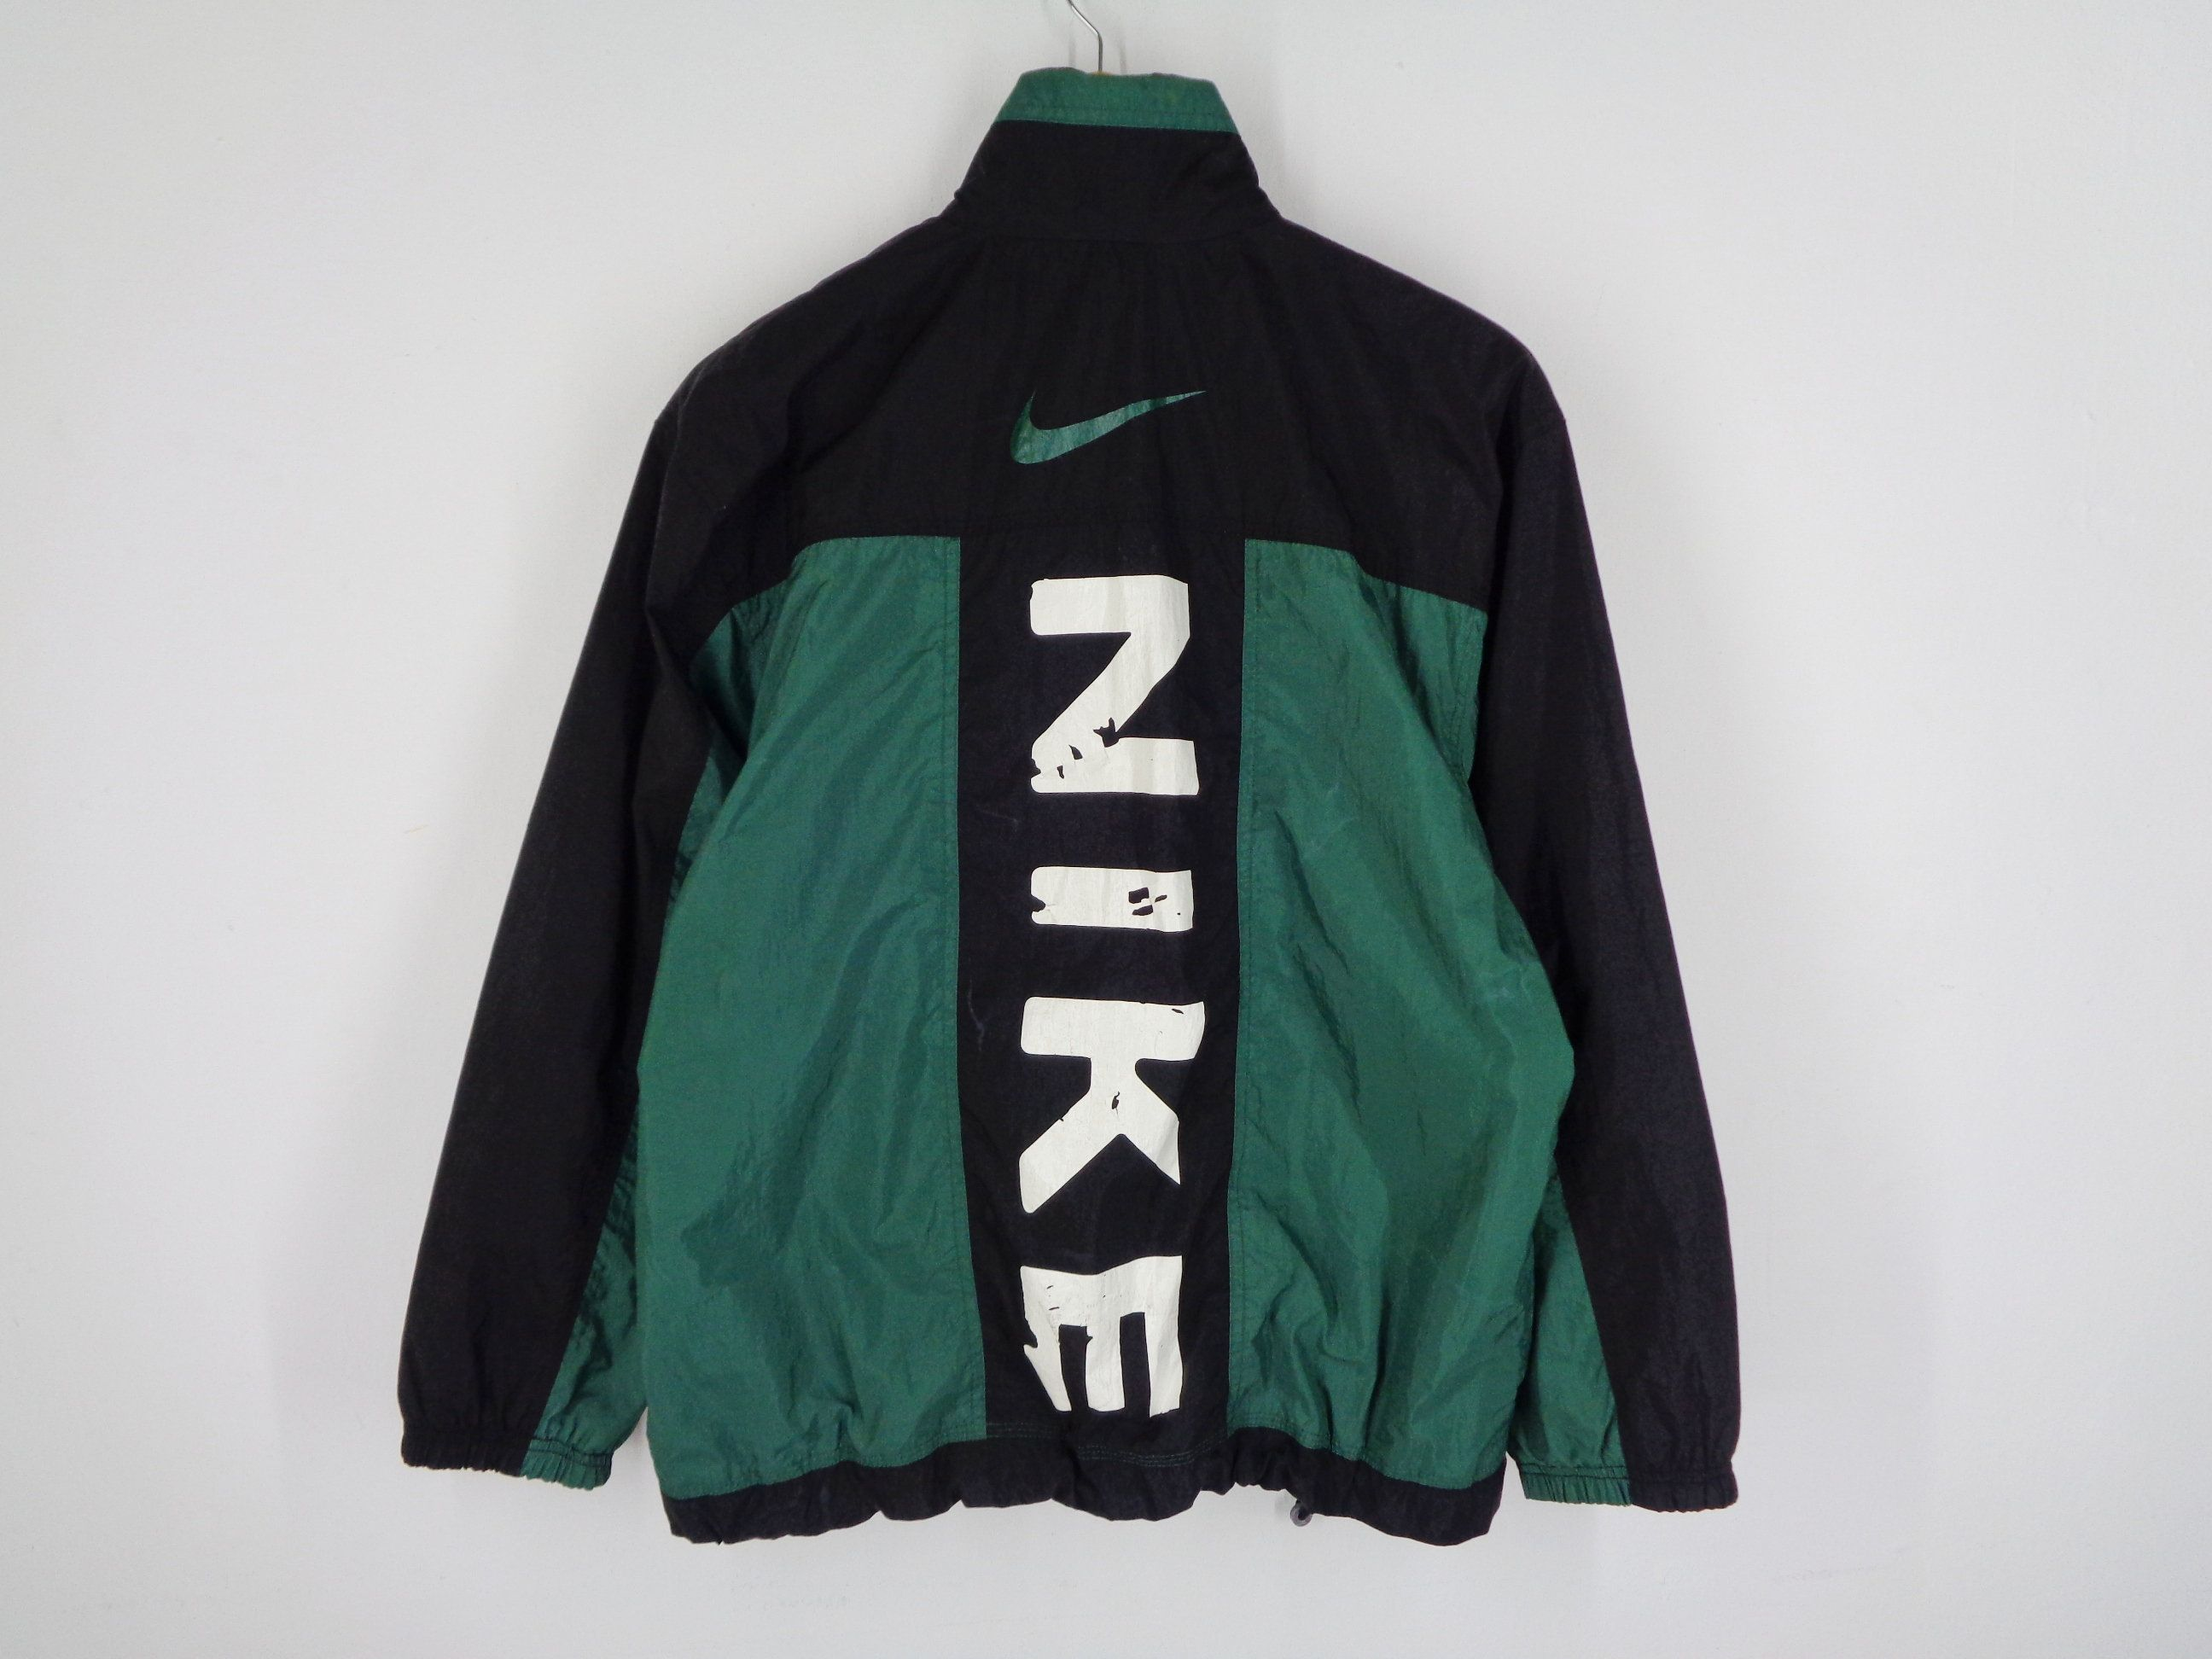 Nike Windbreaker Vintage Nike Jacket Vintage 90 S Nike Etsy Vintage Nike Jacket Nike Windbreaker Denim Jacket Women